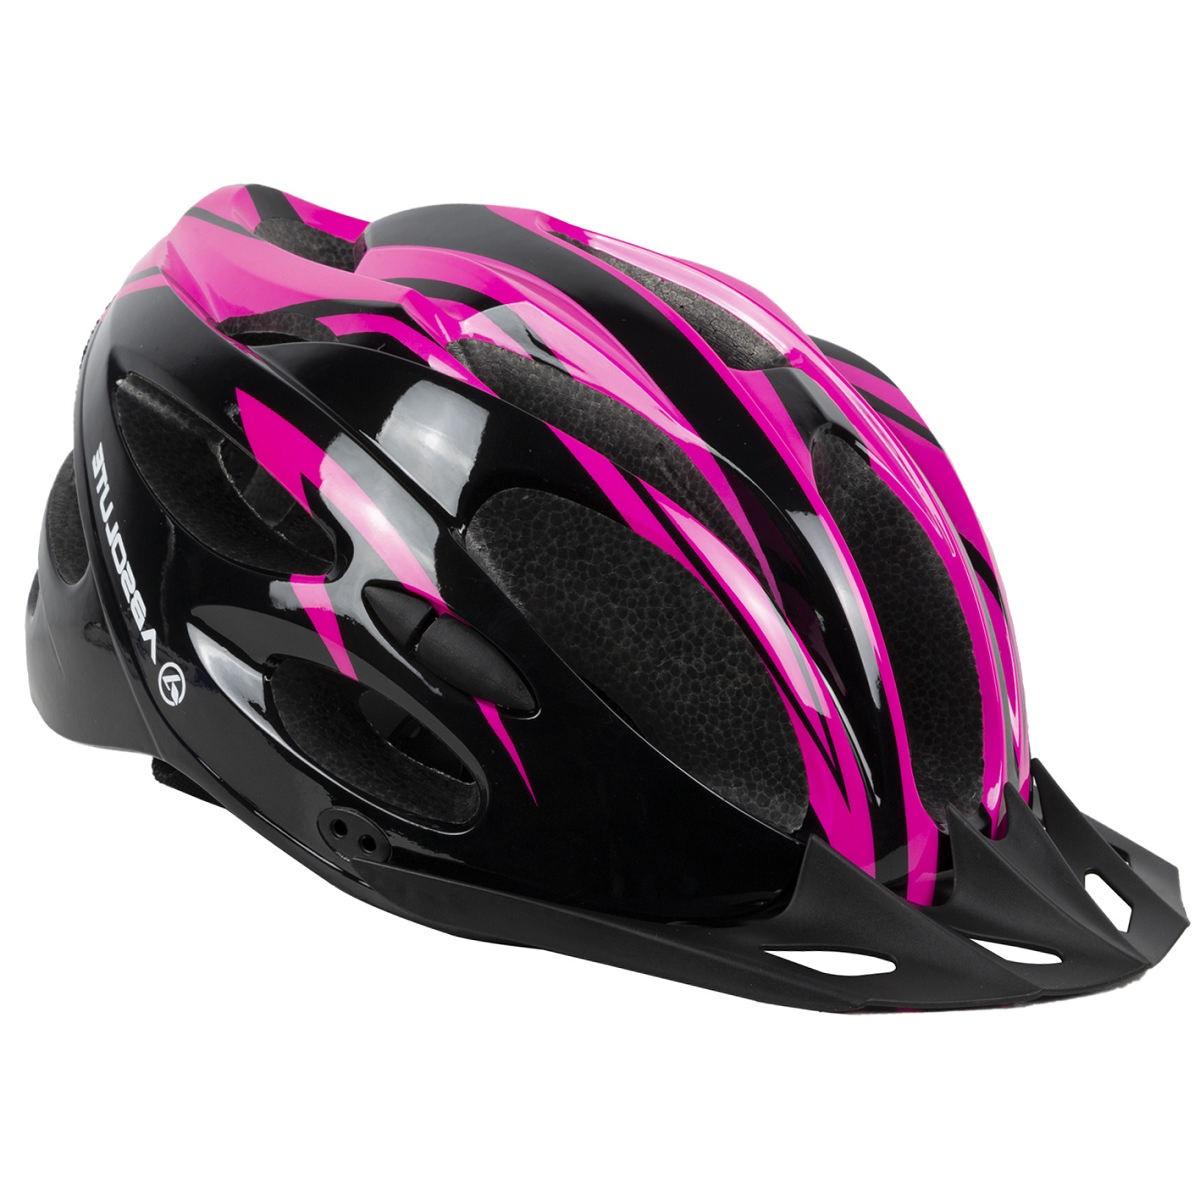 Capacete Ciclismo Bike Absolute Nero c/ Led - Pto / Rosa